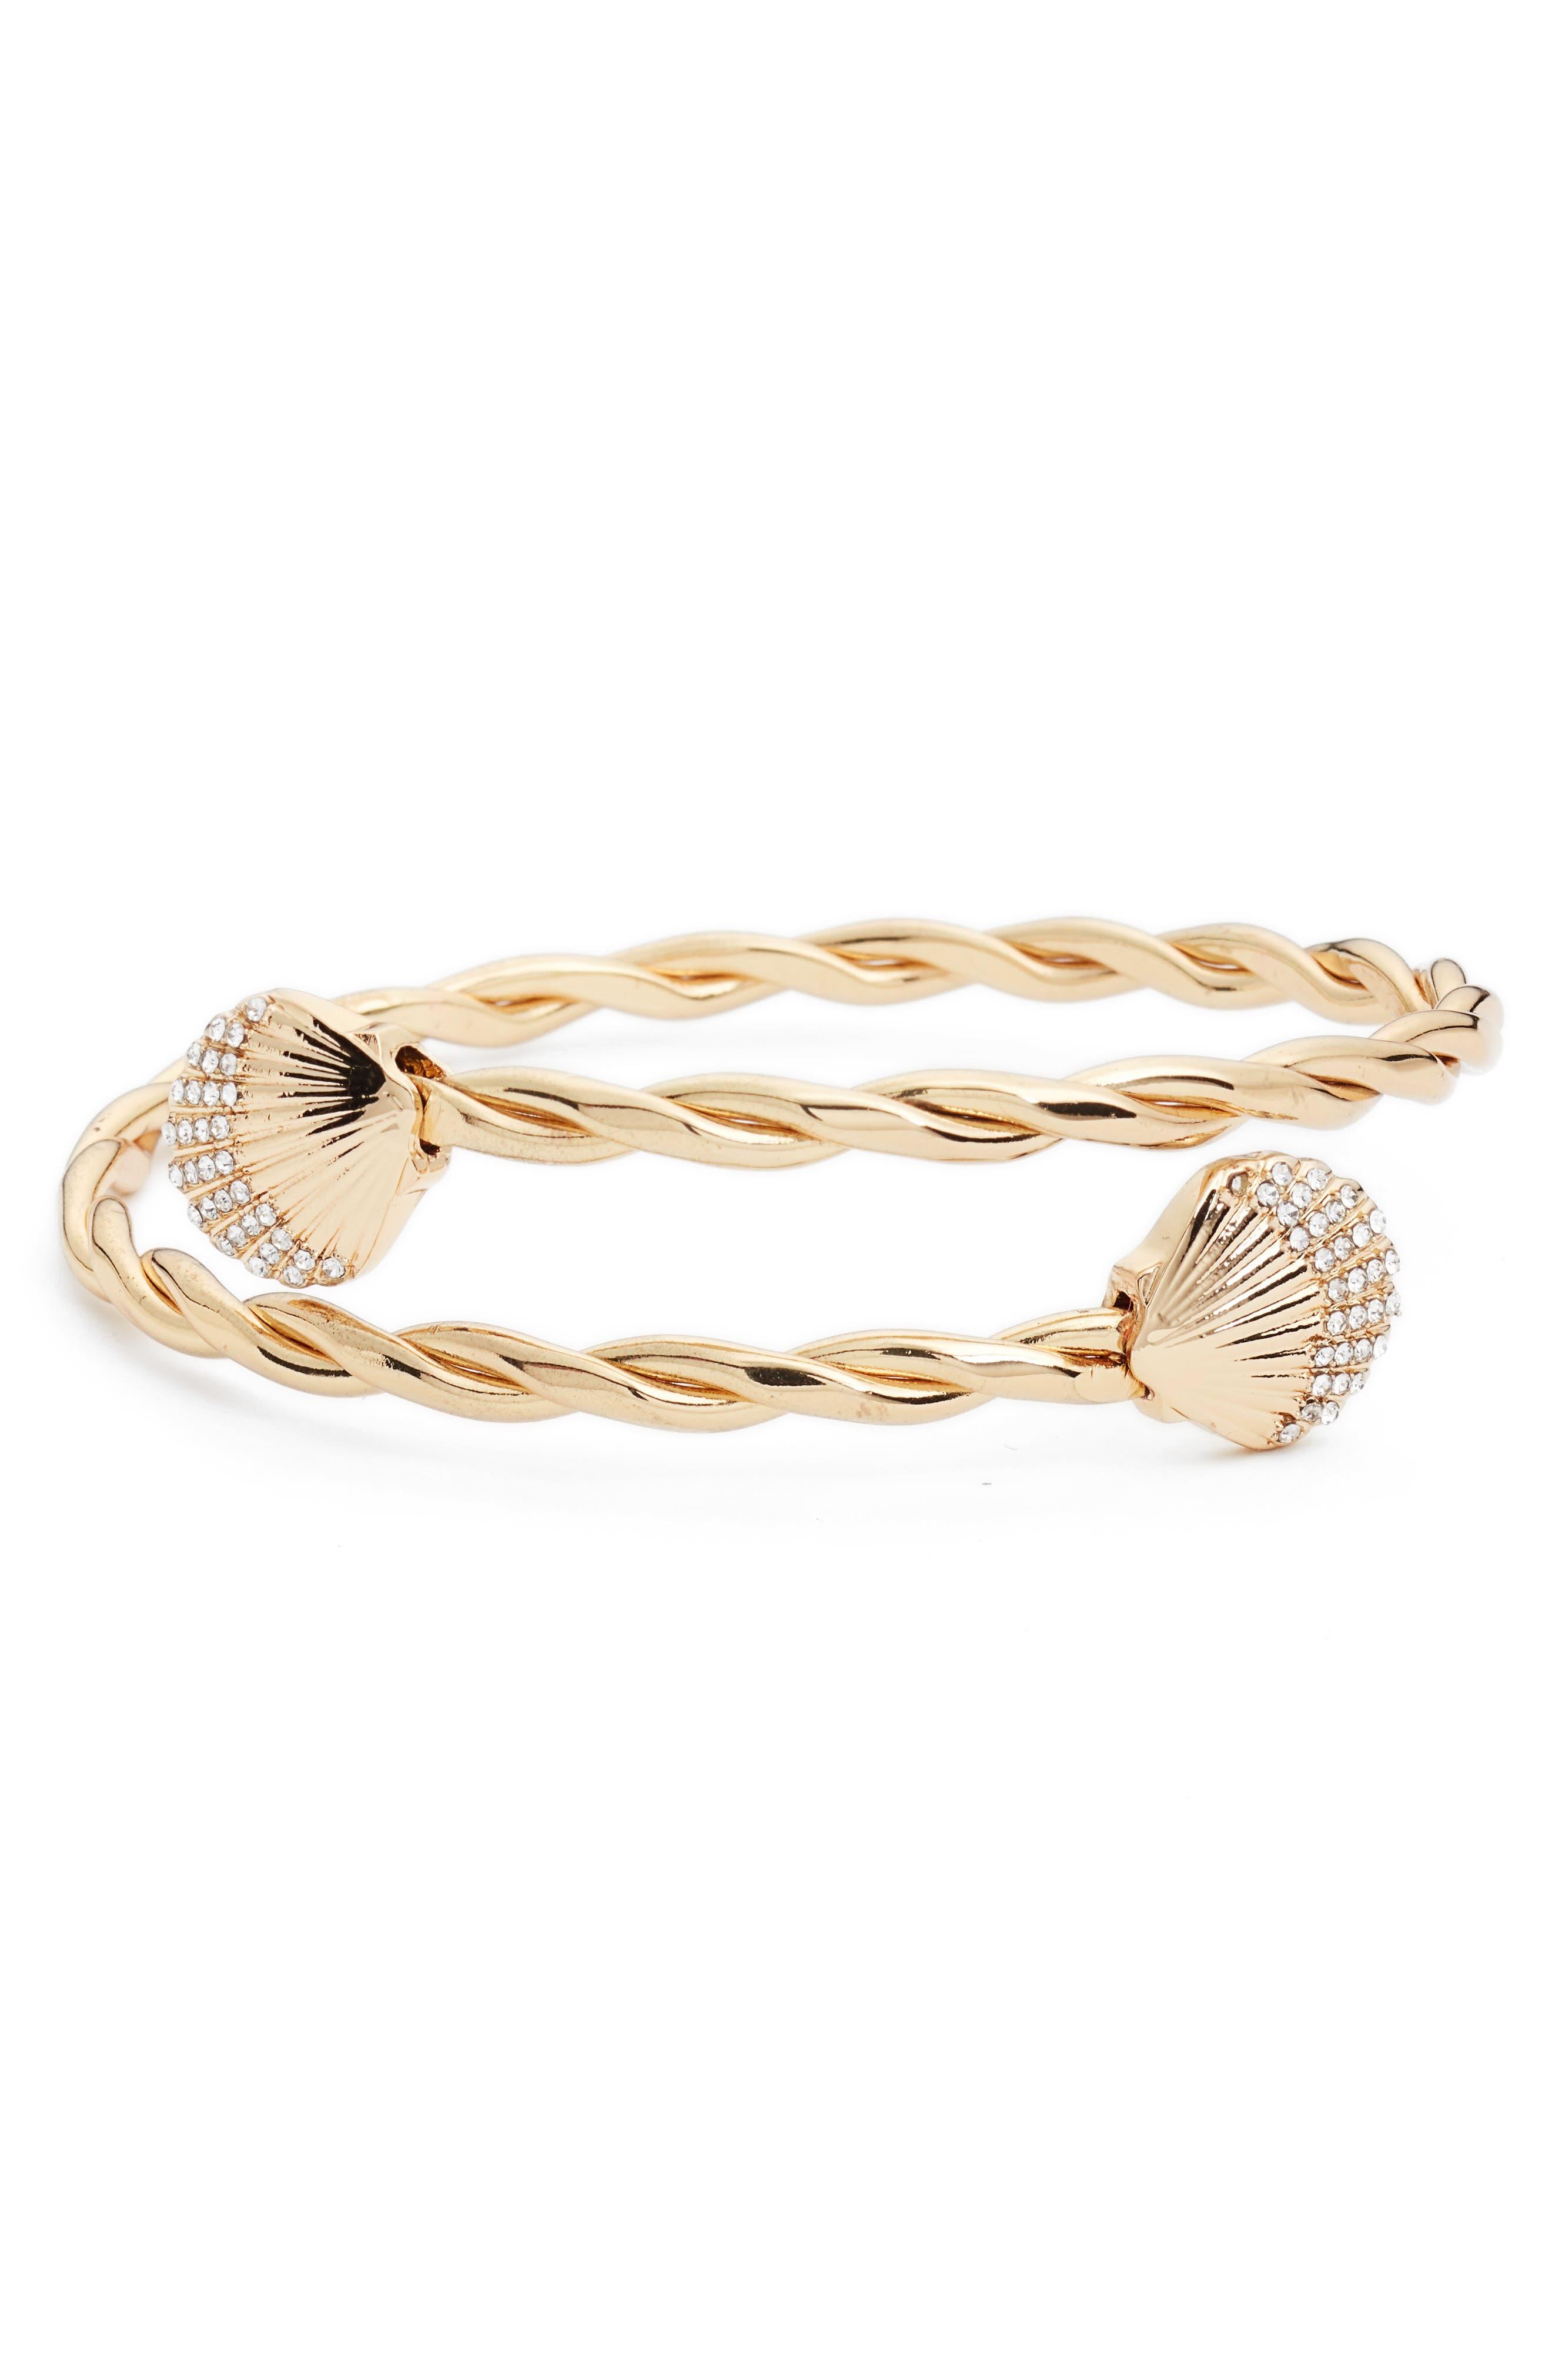 Celestial Seas Arm Cuff Bracelet,                             Main thumbnail 1, color,                             GOLD METALLIC